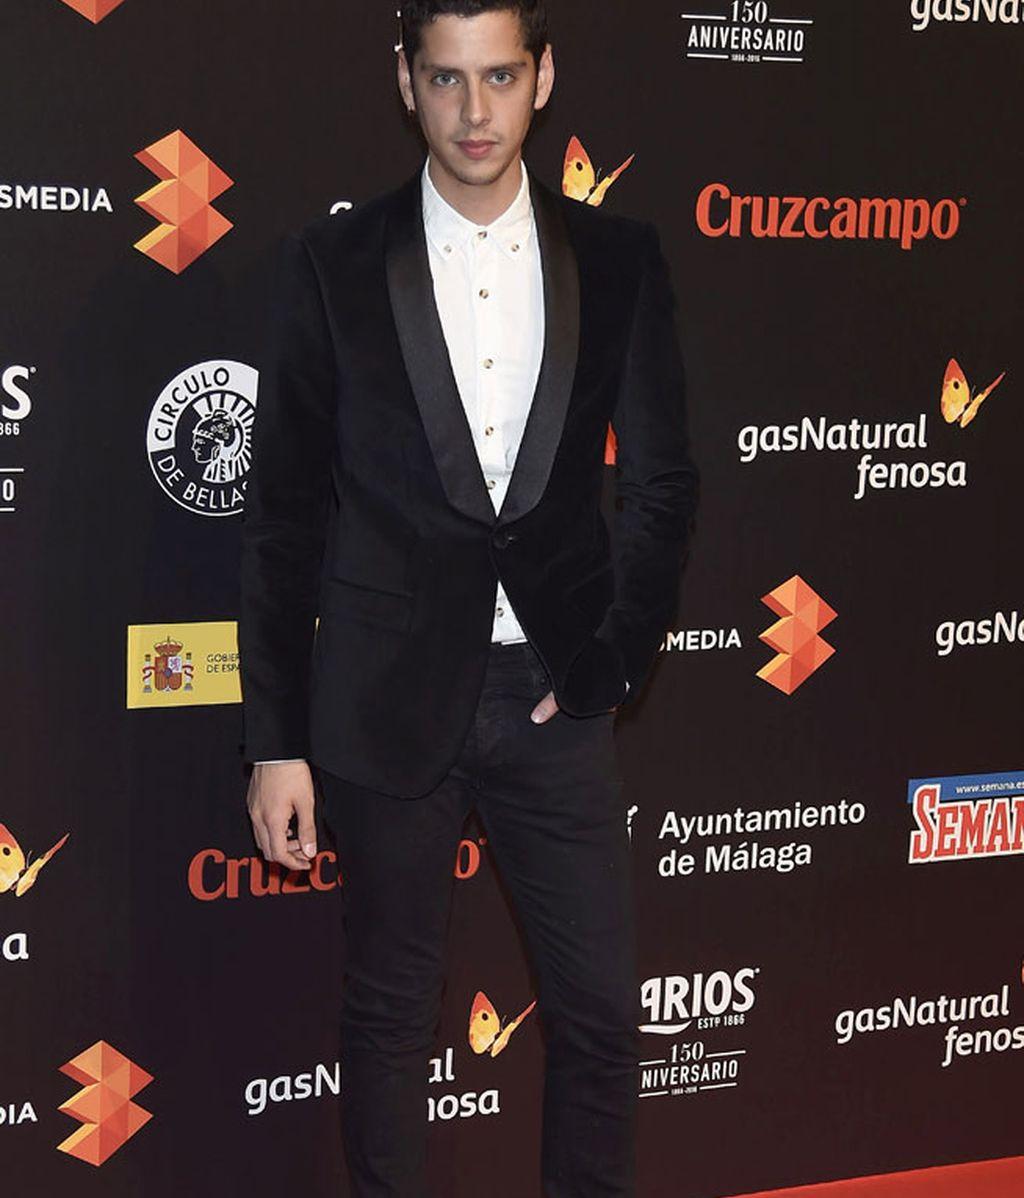 Eduardo Casanova, traje negro con calcetines blancos